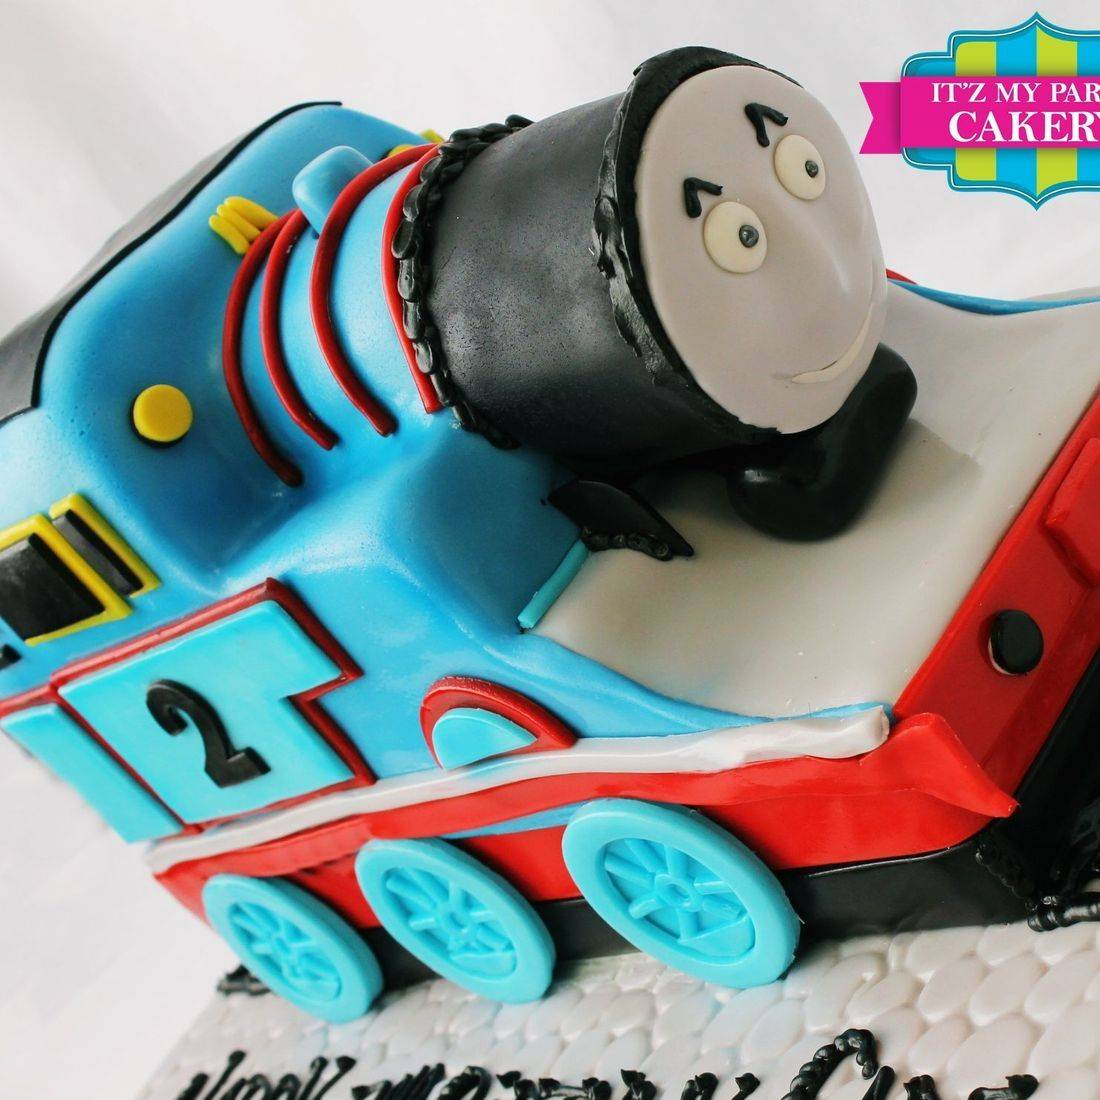 Thomas The Train Carved Dimensional Cake Milwaukee